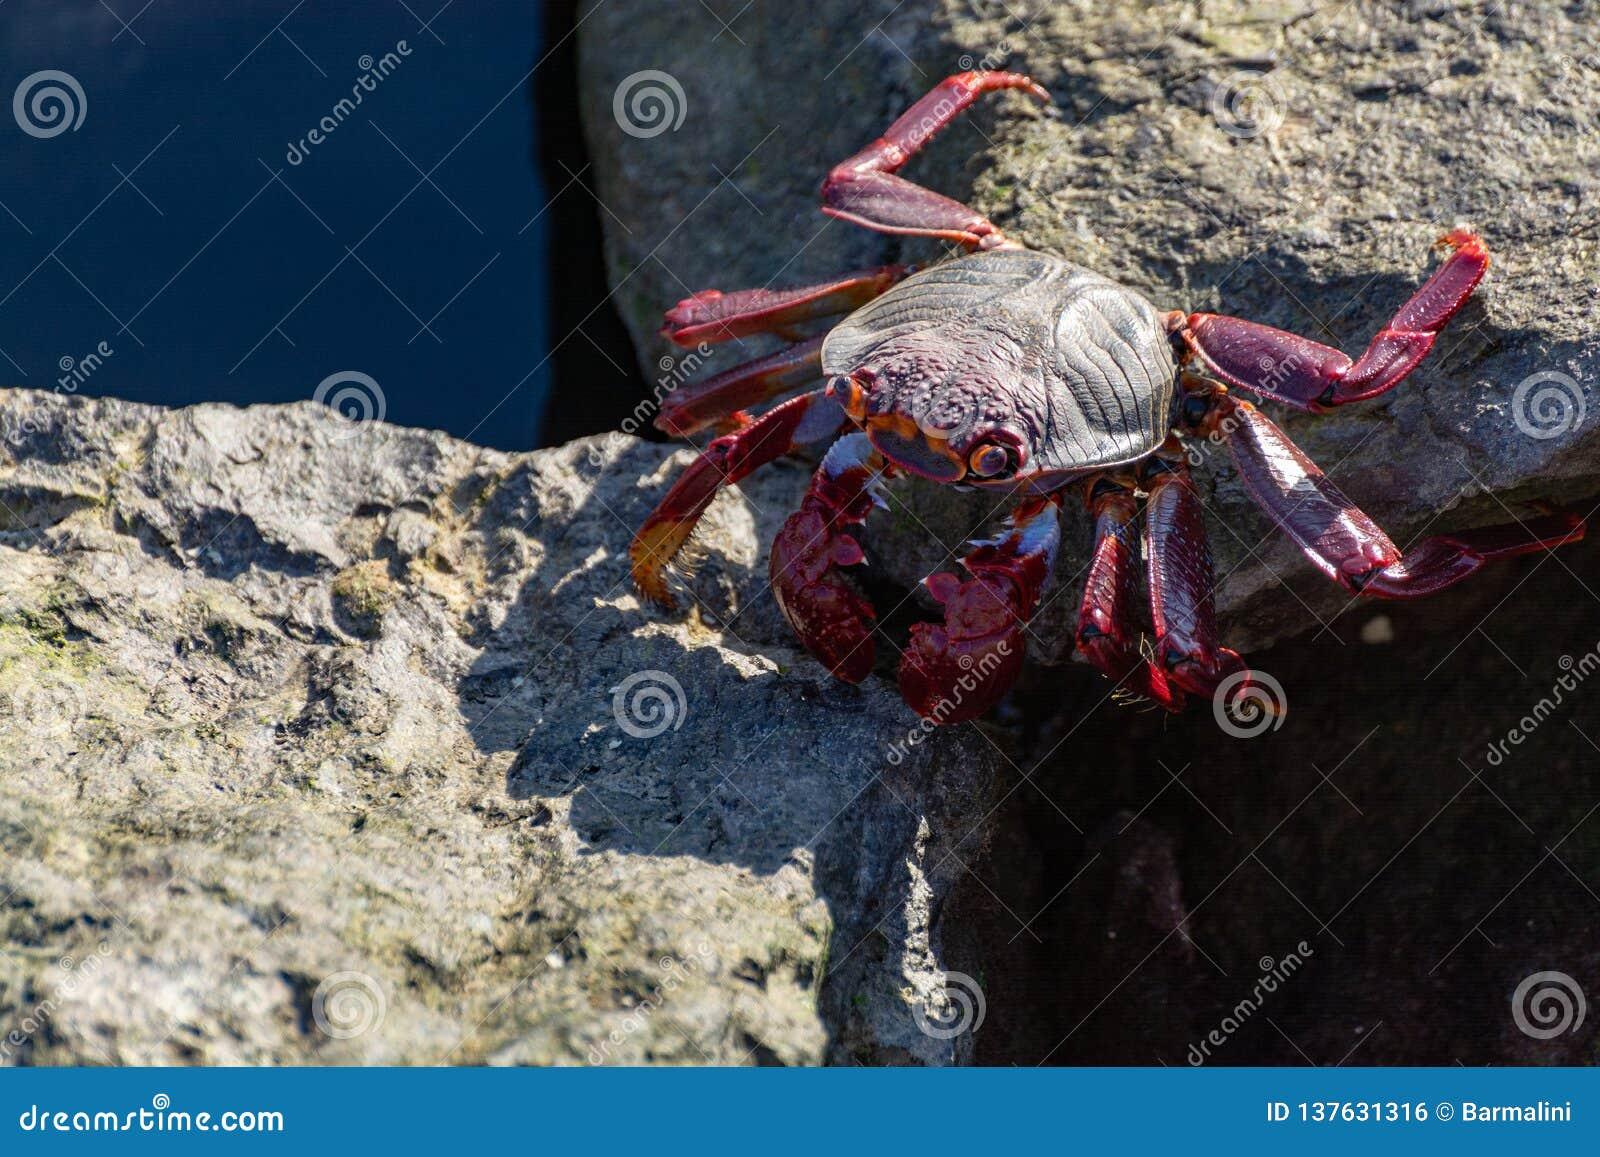 Moorish red legged crab (Grapsus adscensionis), a common crustacean of Gran Canaria, Canary Islands, Spain